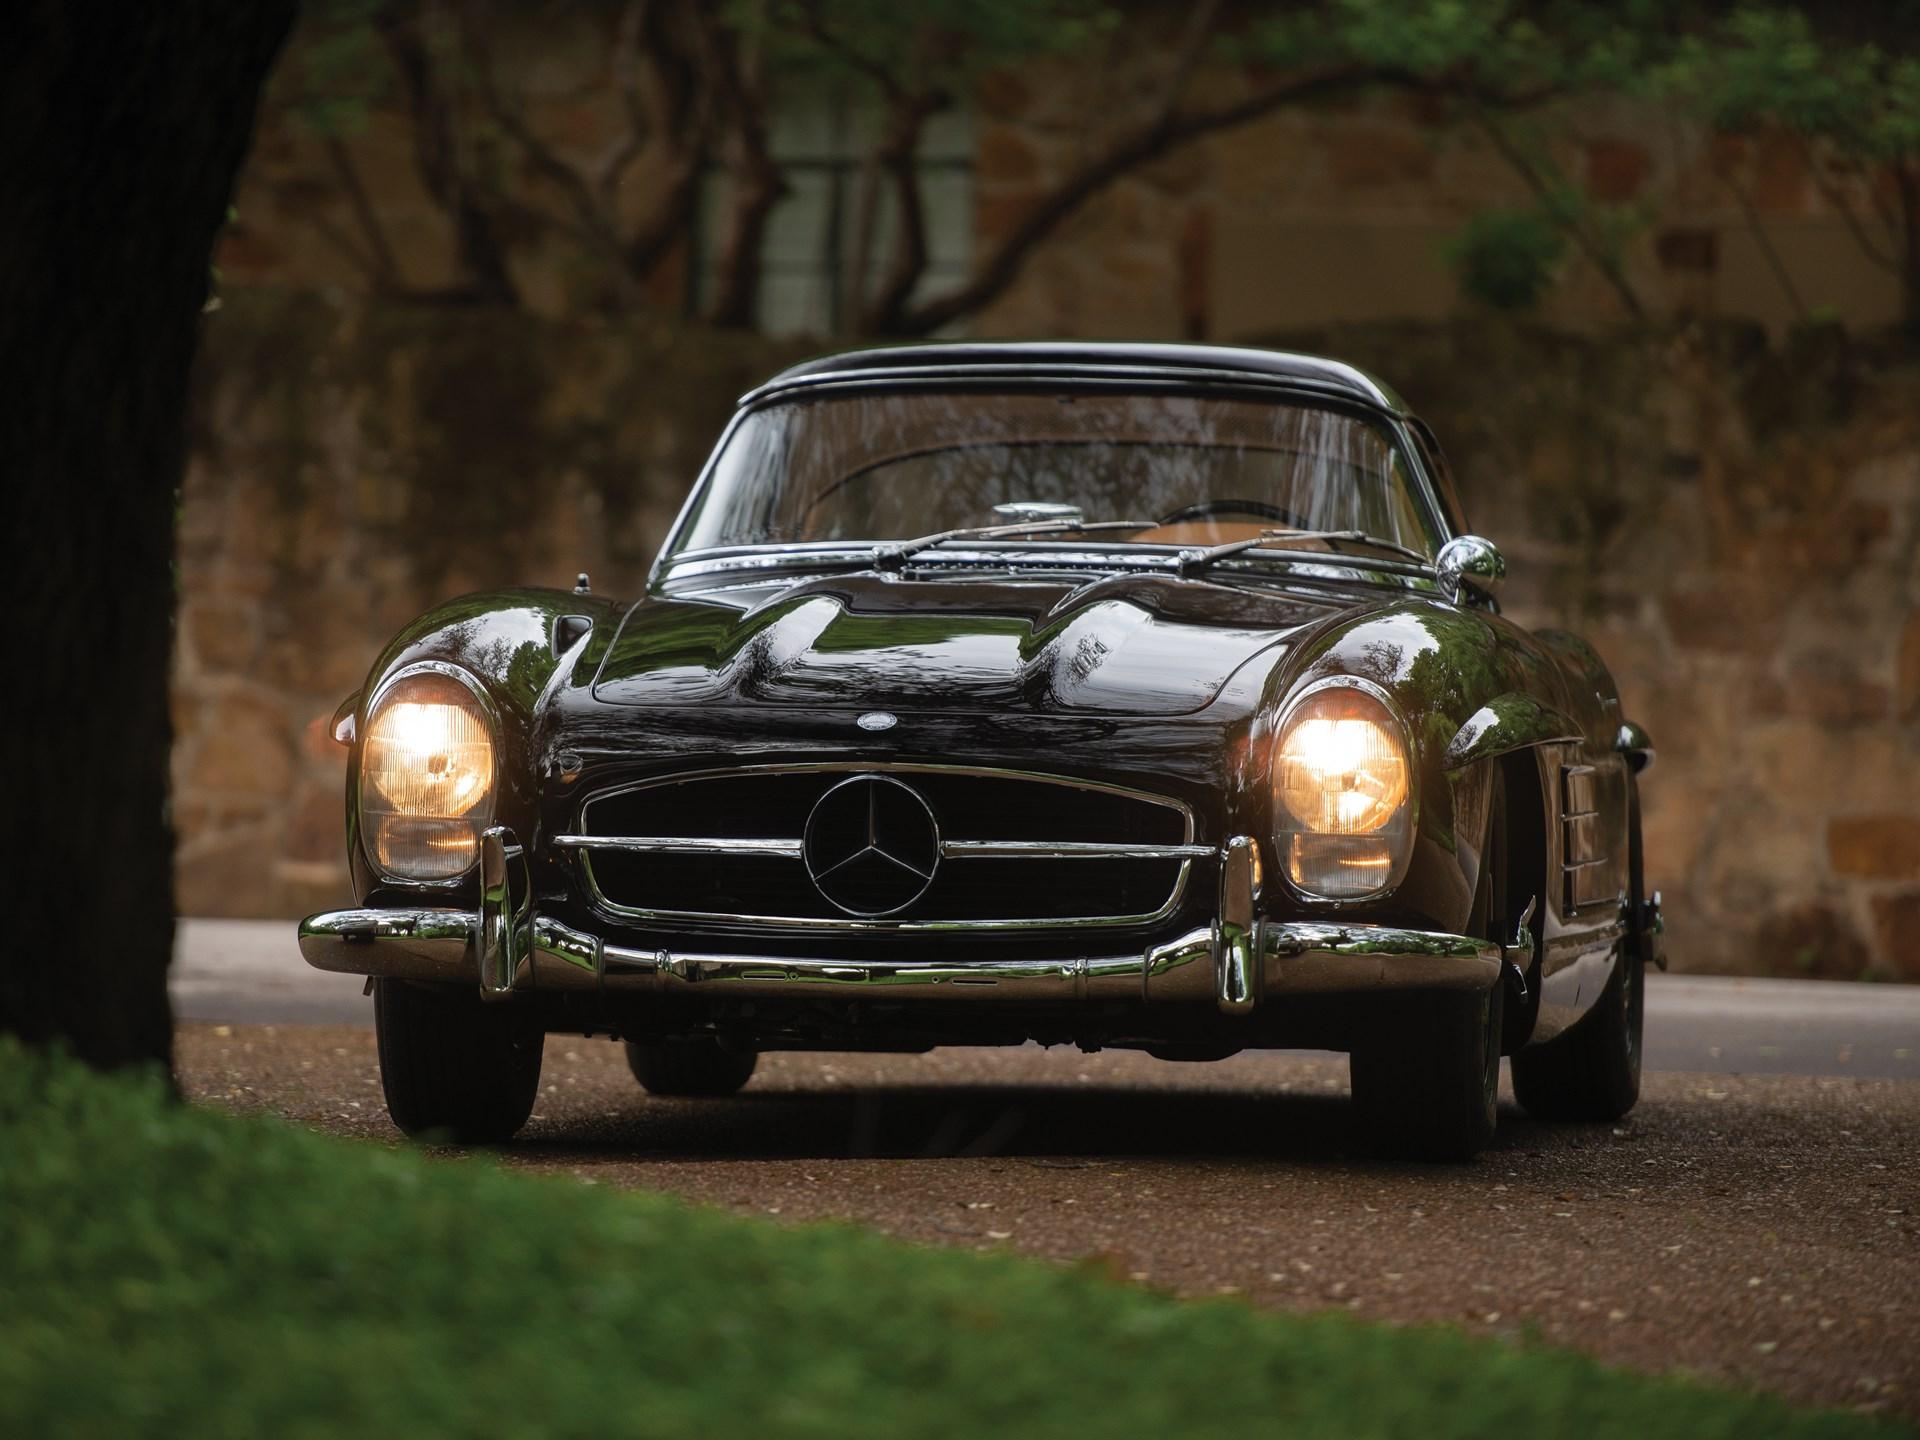 1961 Mercedes-Benz 300 SL Roadster